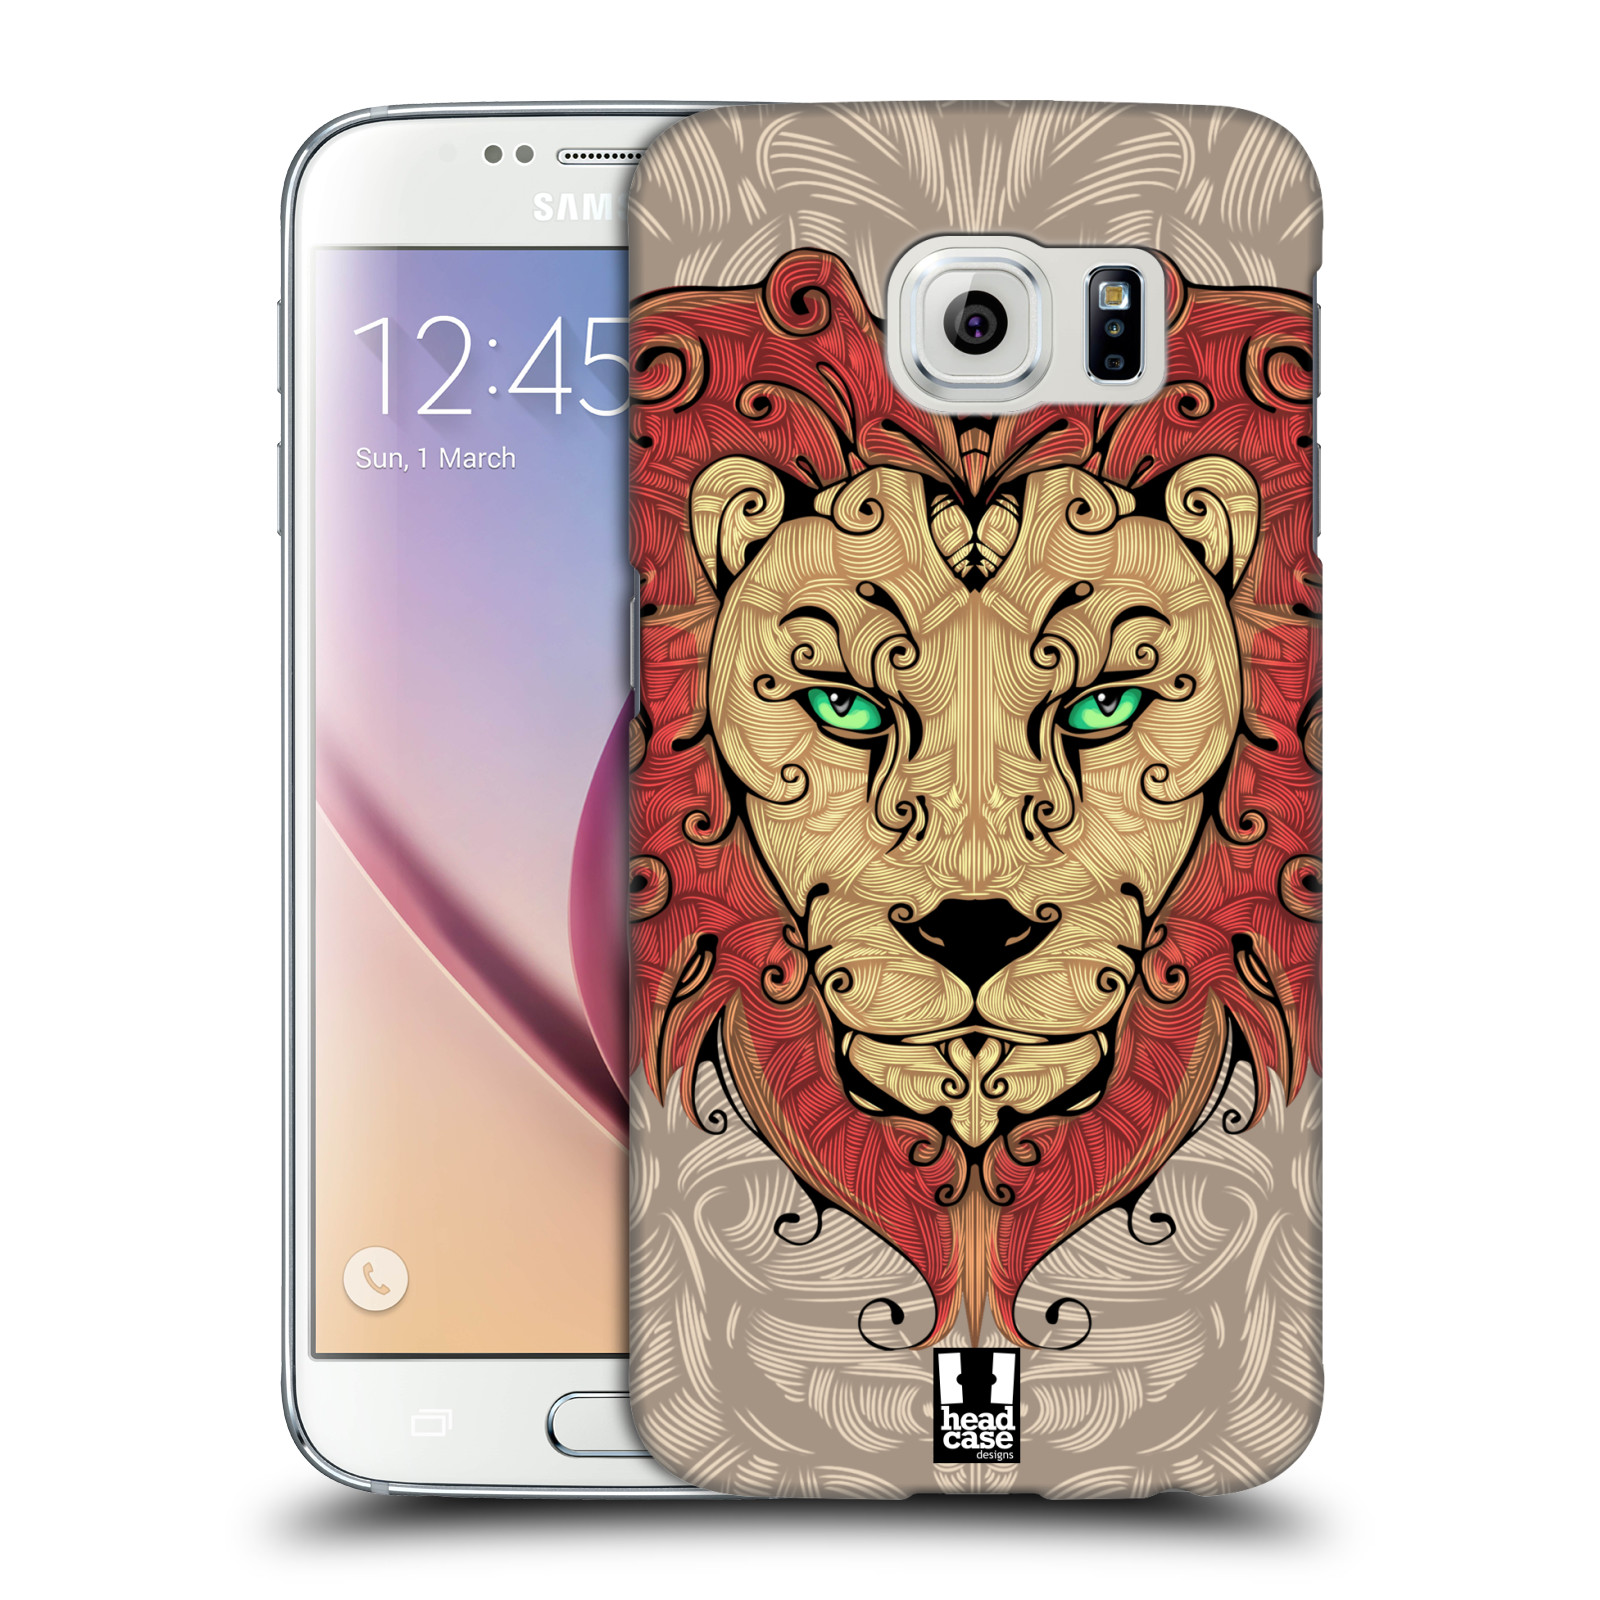 HEAD CASE plastový obal na mobil SAMSUNG Galaxy S6 (G9200, G920F) vzor kudrlinky zvíře lev